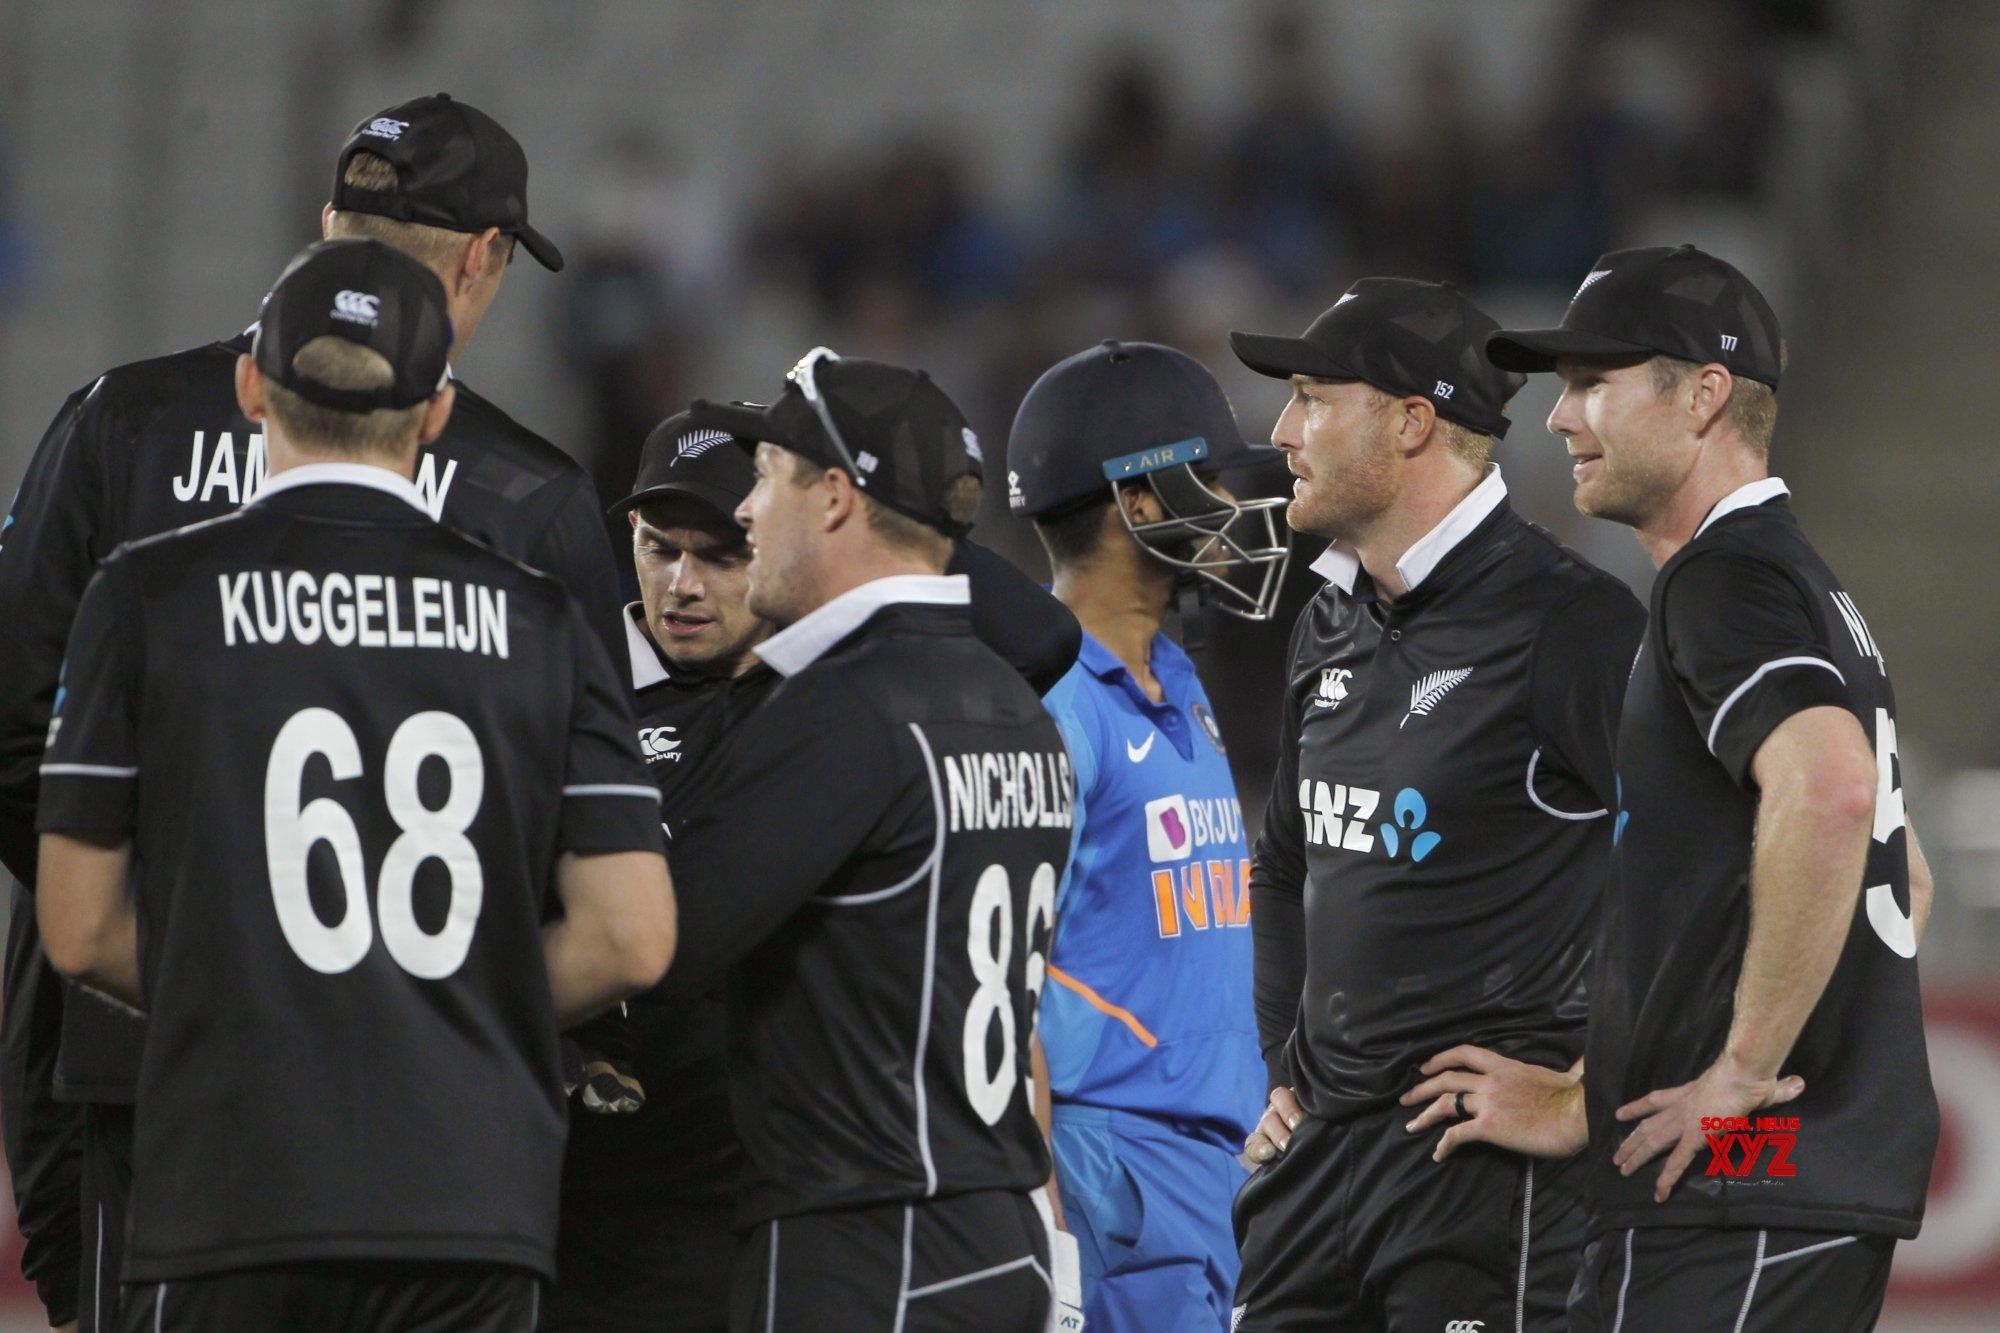 Auckland: 2nd ODI - India Vs New Zealand (Batch - 13) #Gallery